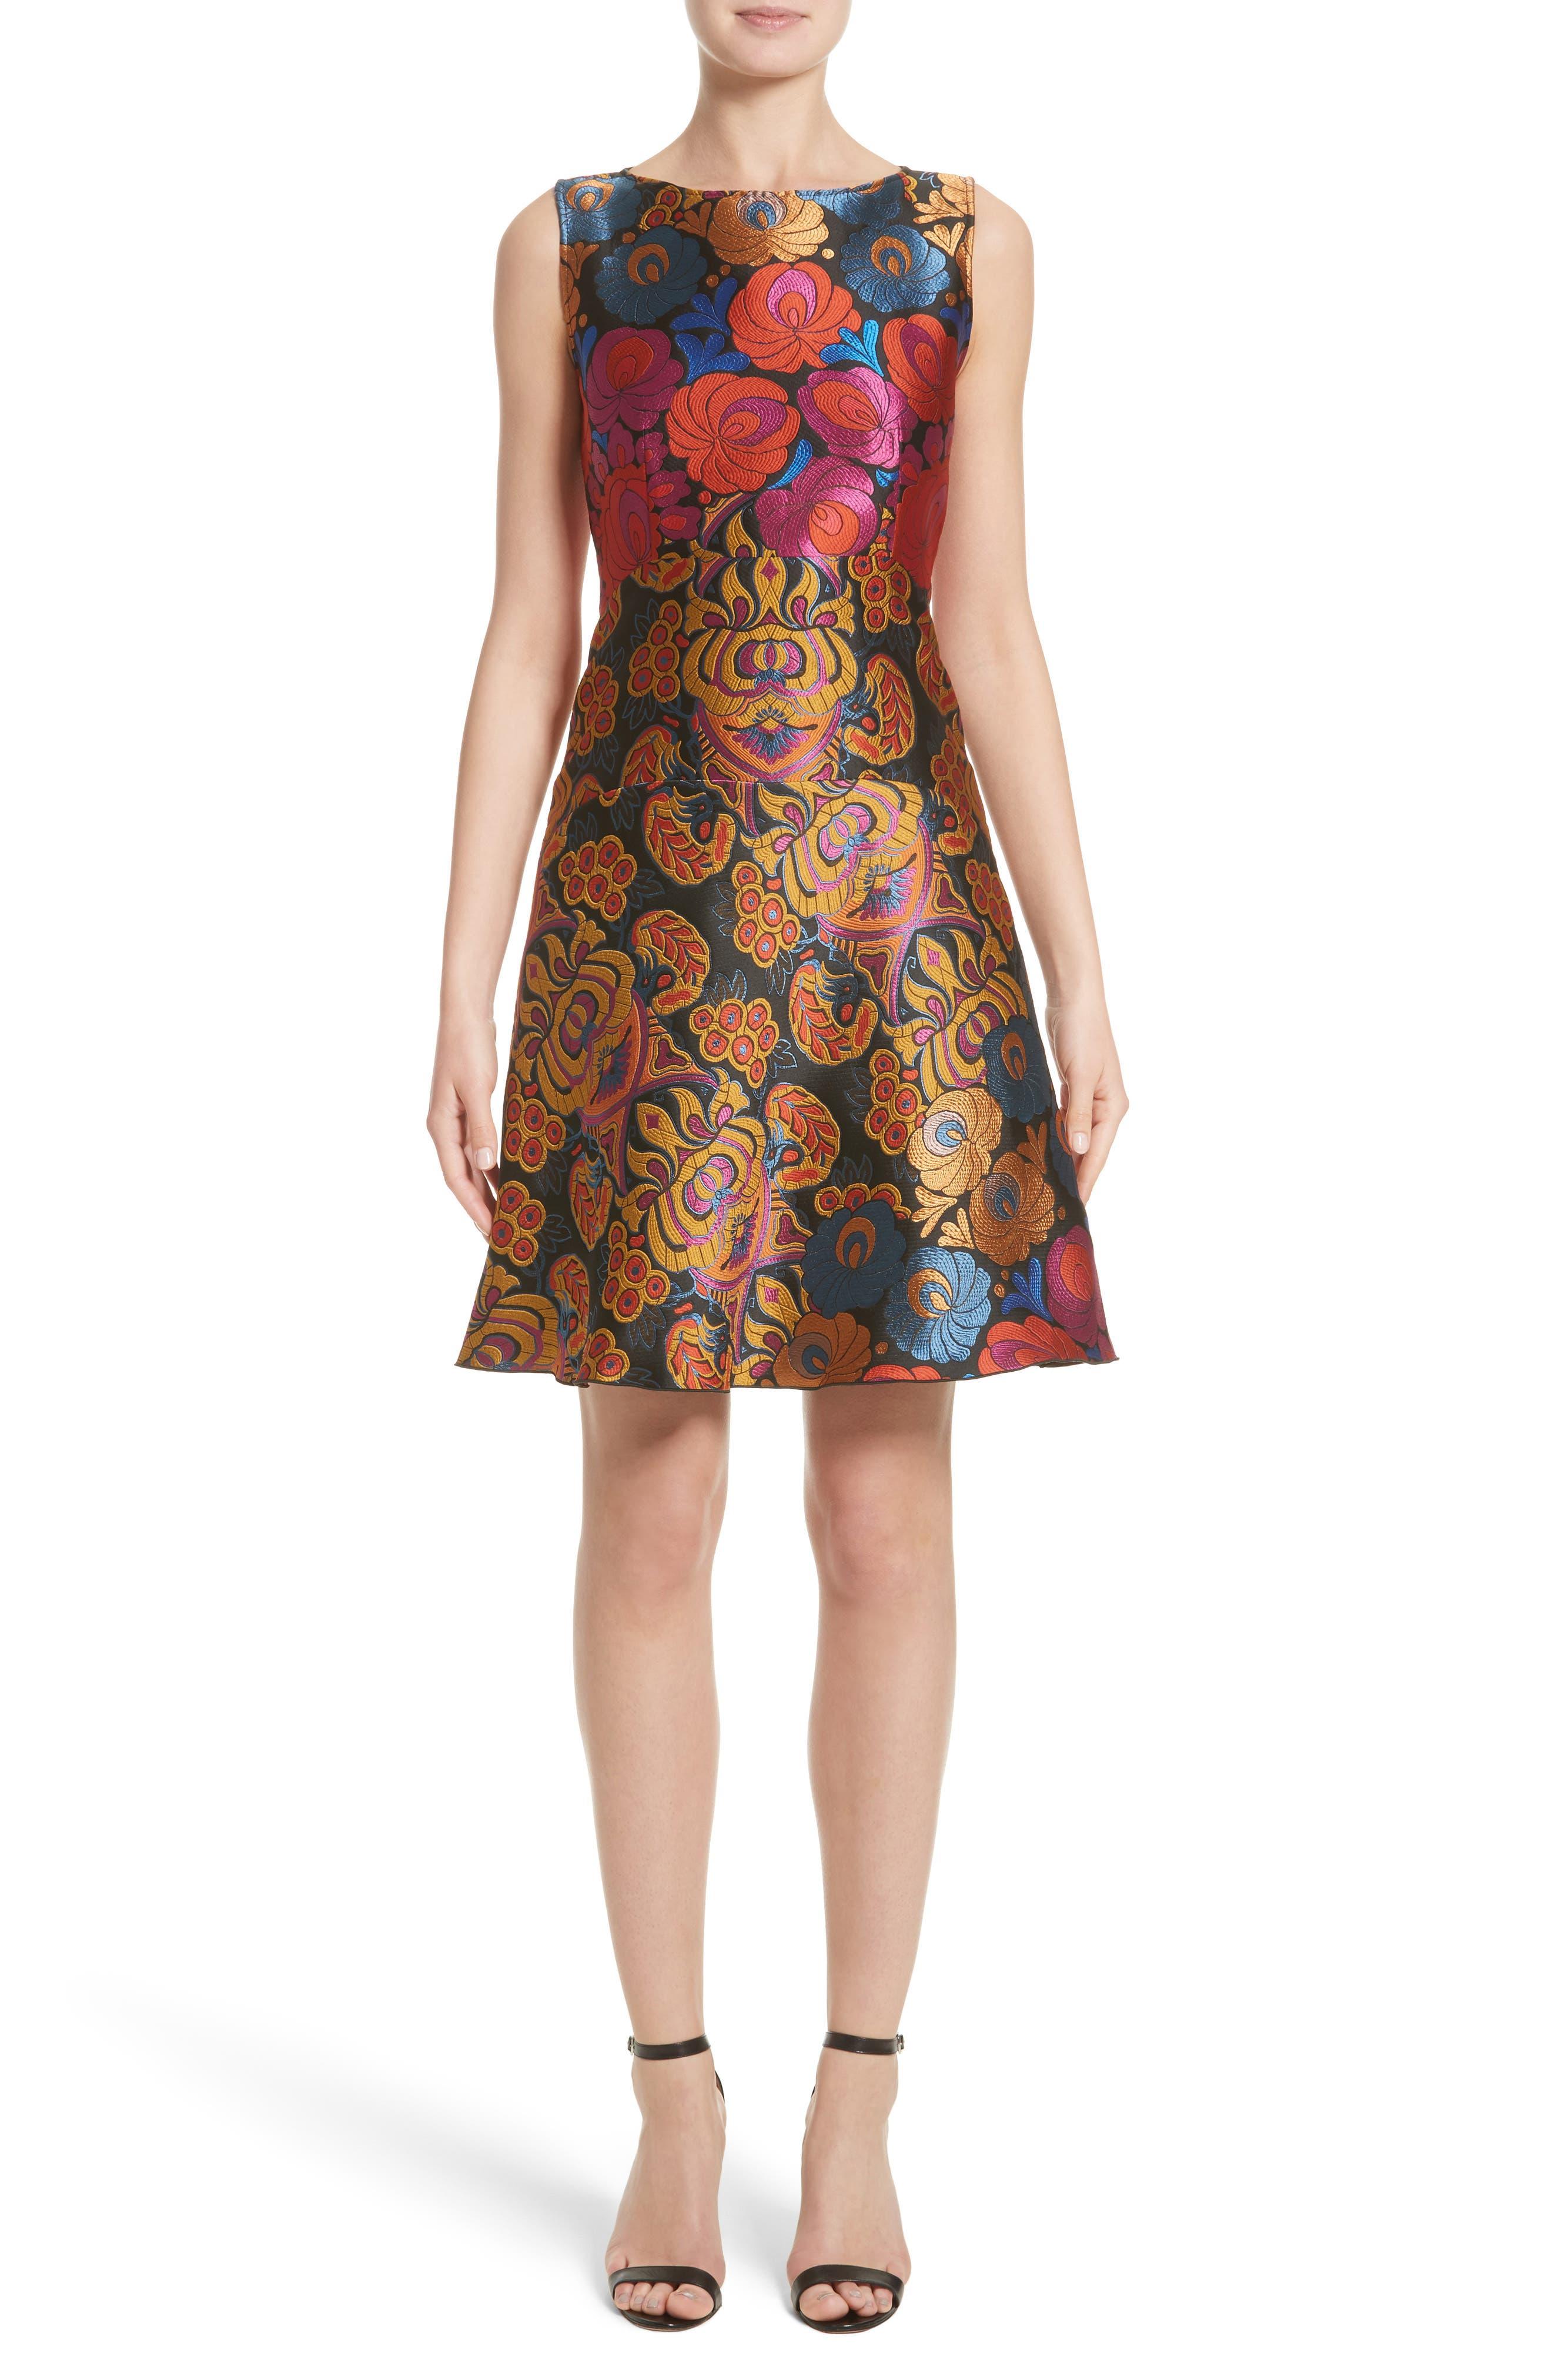 Alternate Image 1 Selected - Etro Sleeveless Brocade Dress